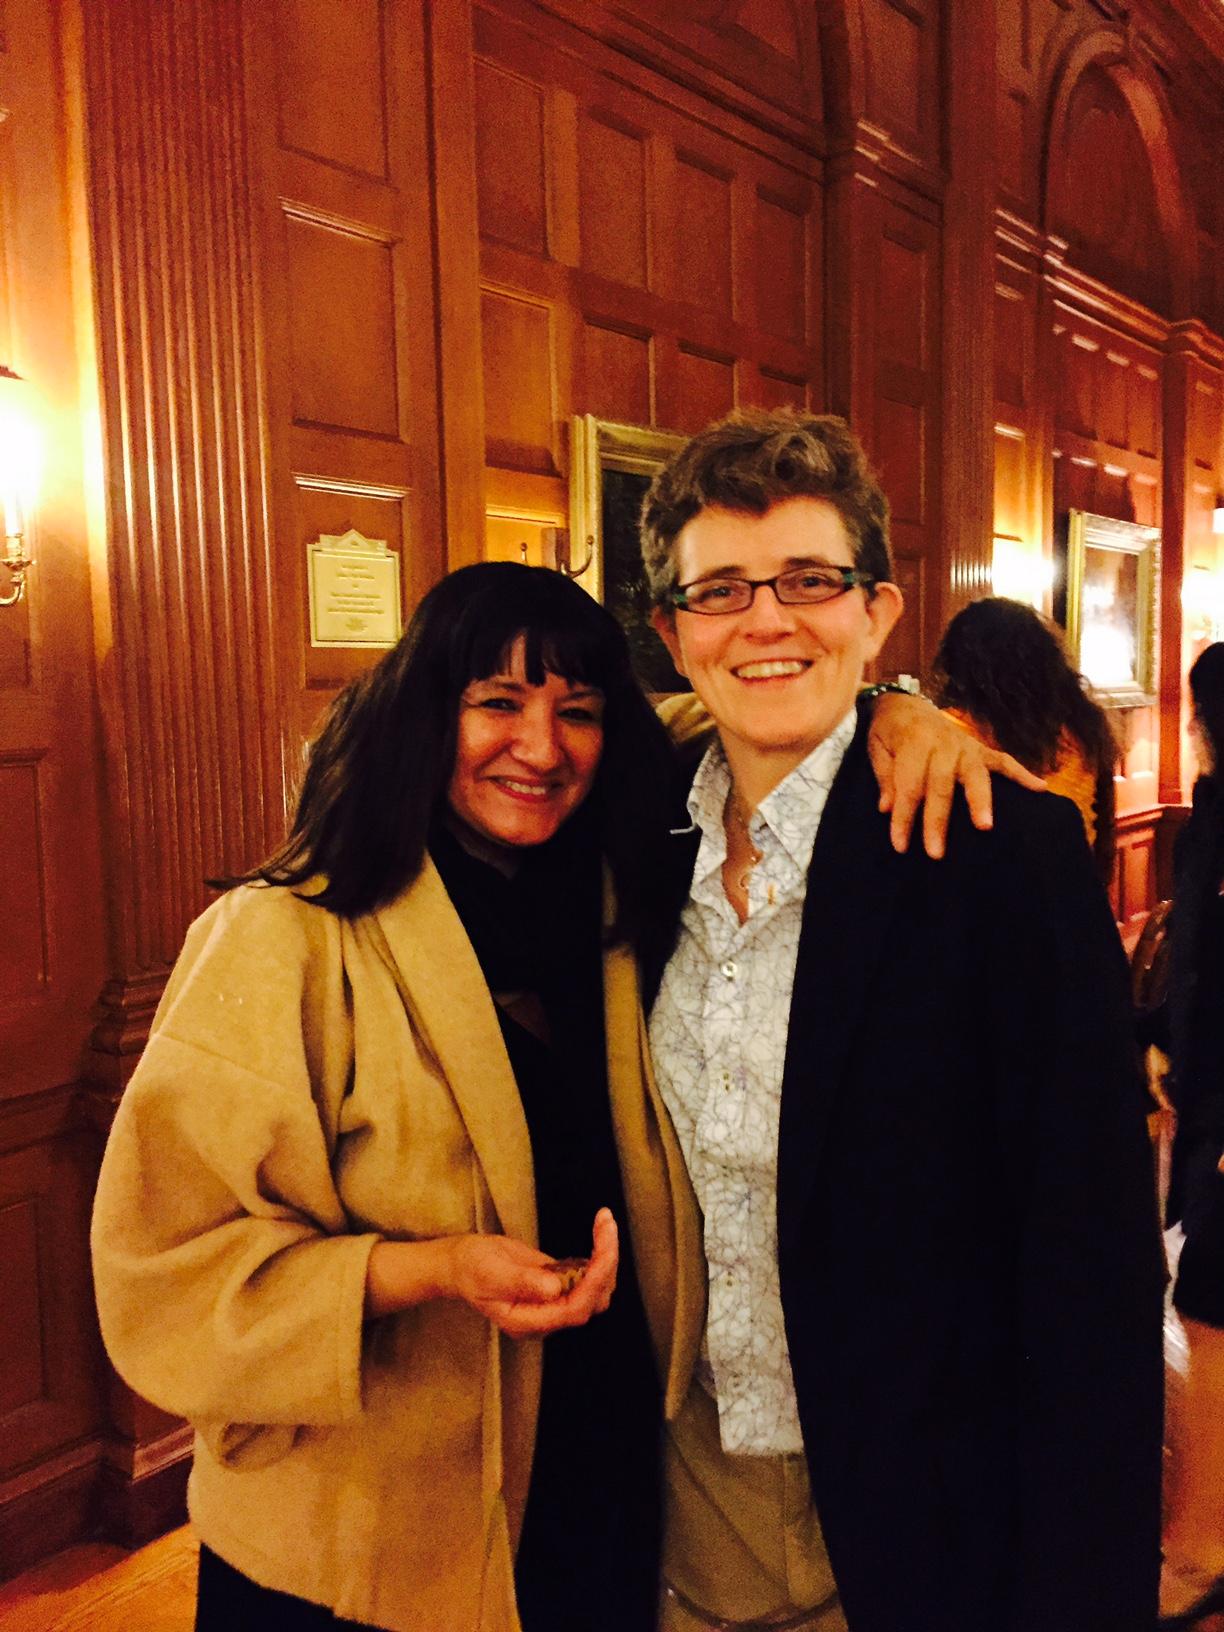 Sandra Cisneros wraps her arm around LSP Director M. DeGuzmán as the two smile towards the camera